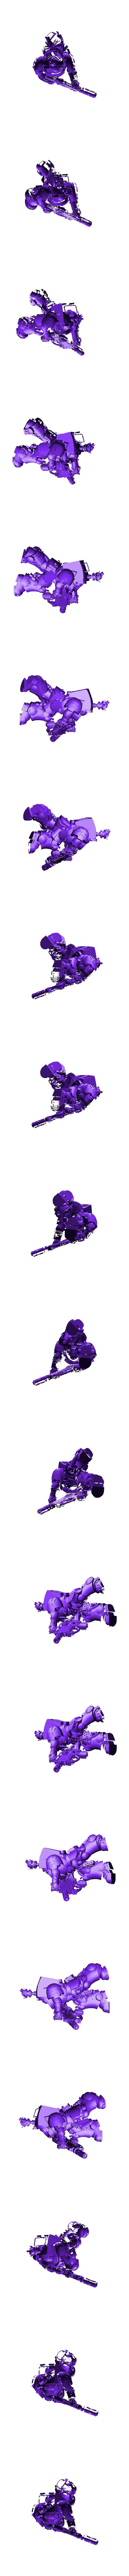 Dark Crusader Heavy Infantry Liquidators - 03.stl Download free STL file Dark Crusader Heavy Infantry Liquidator Squad • 3D printing design, GrimmTheMaker